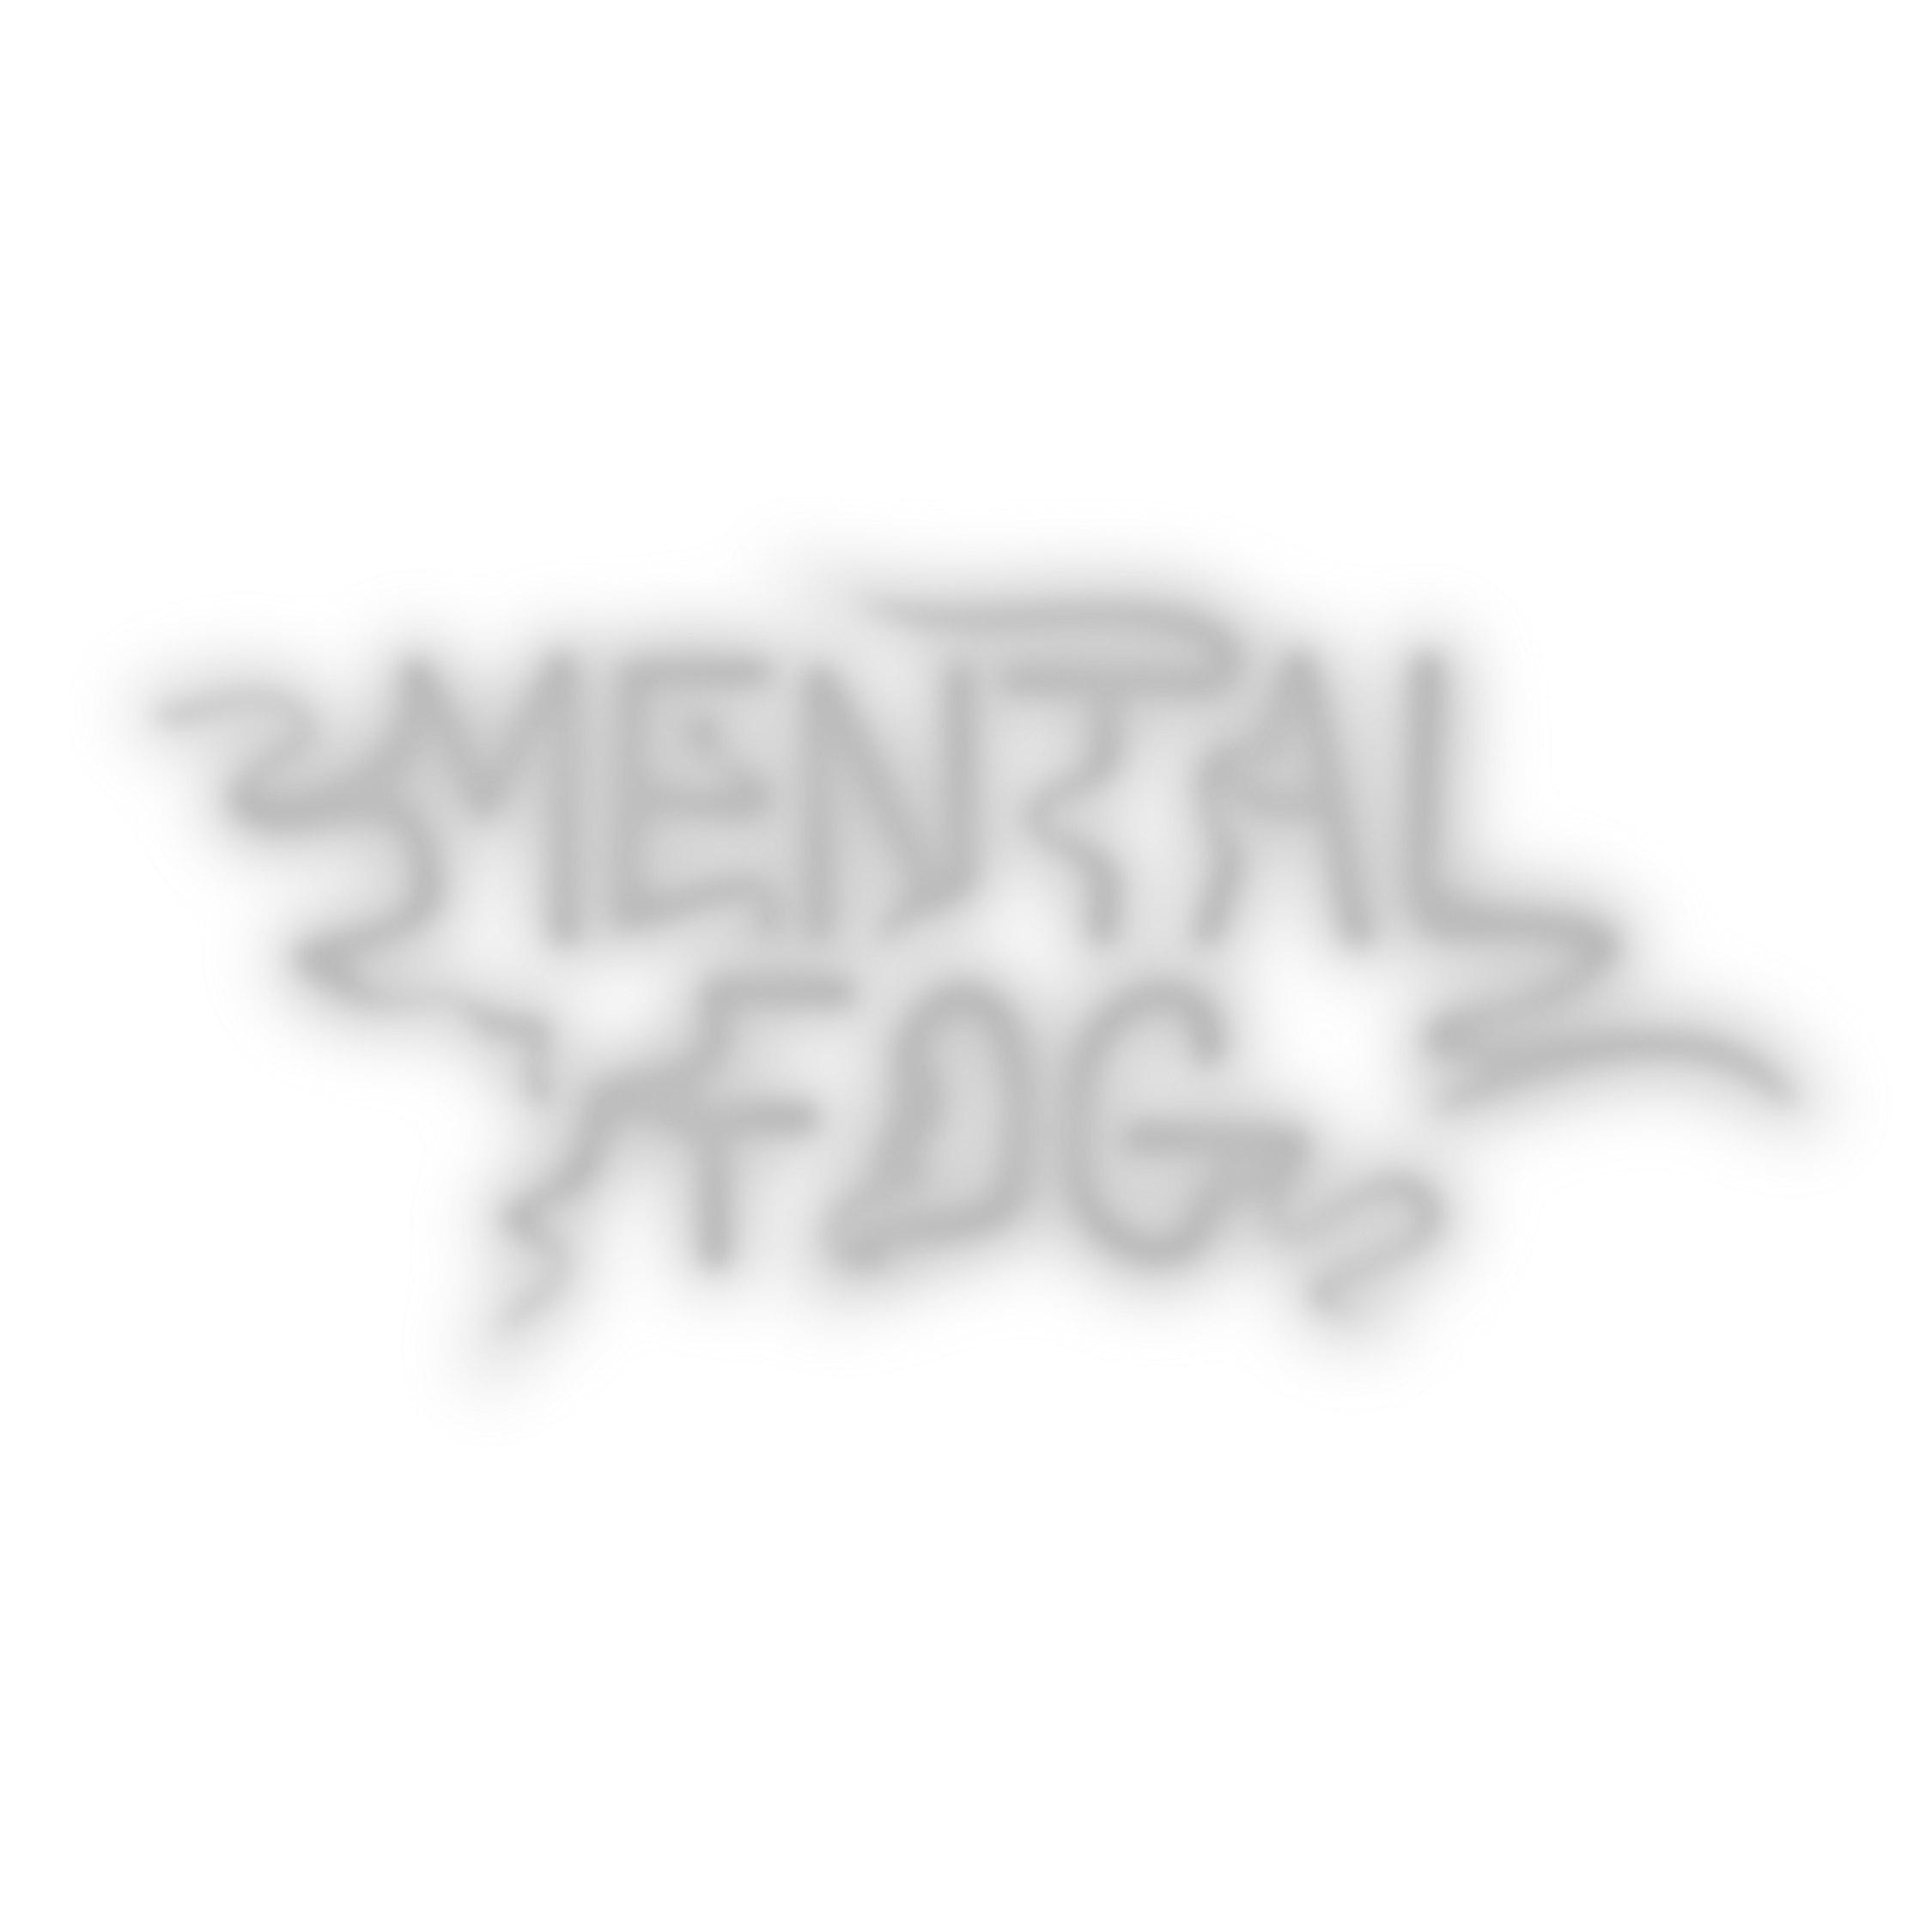 mentalfognew-01.jpg